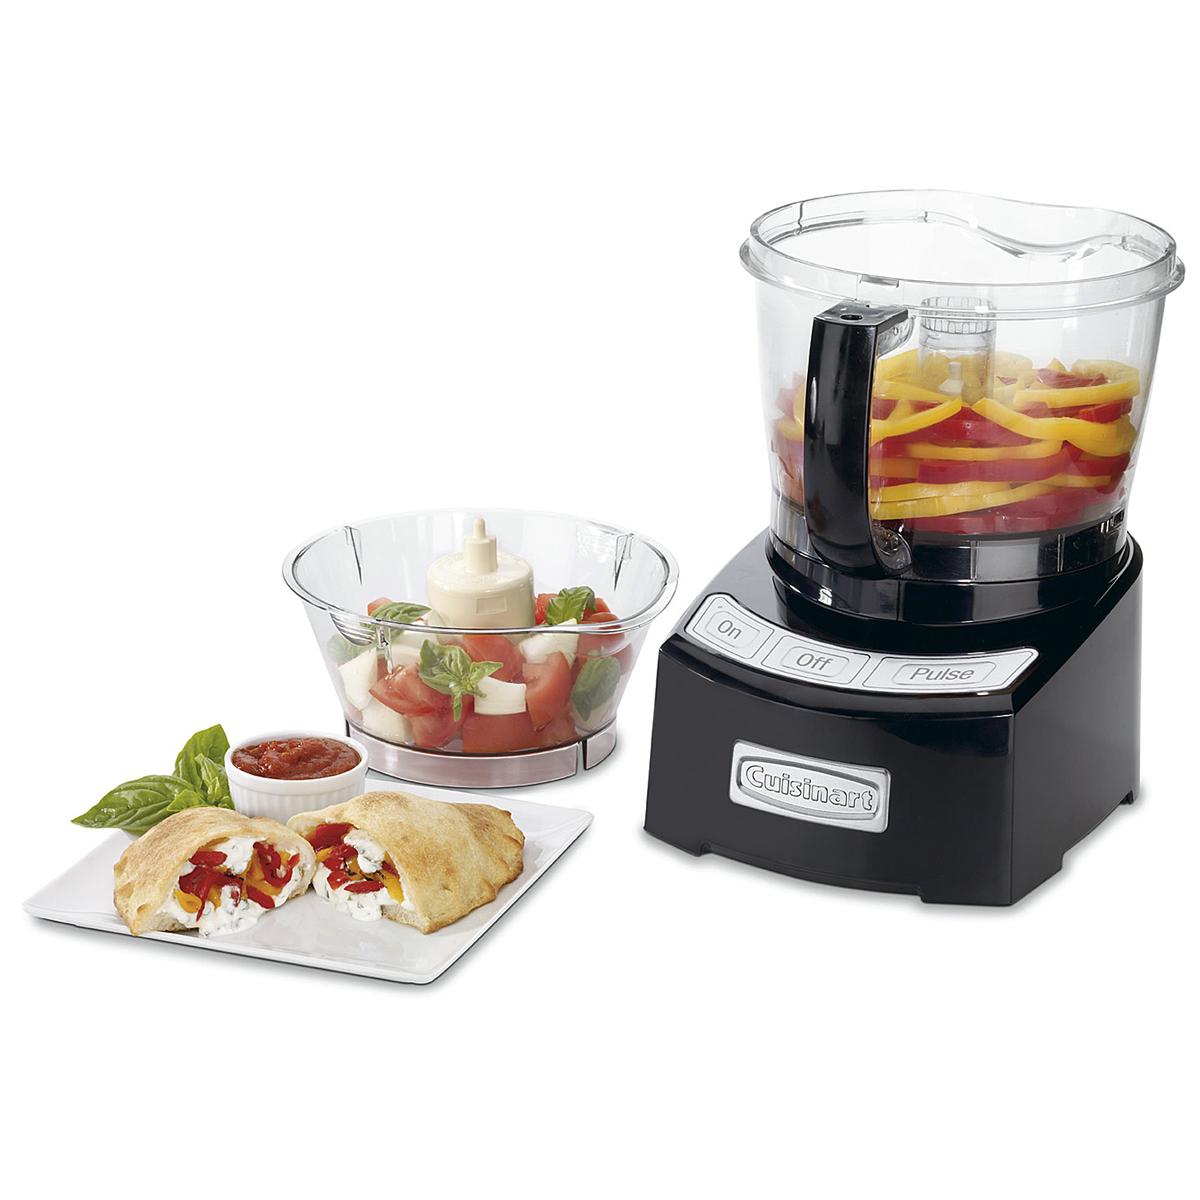 Cuisinart elite collection 12 cup 3 l food processor - Cuisinart home cuisine ...